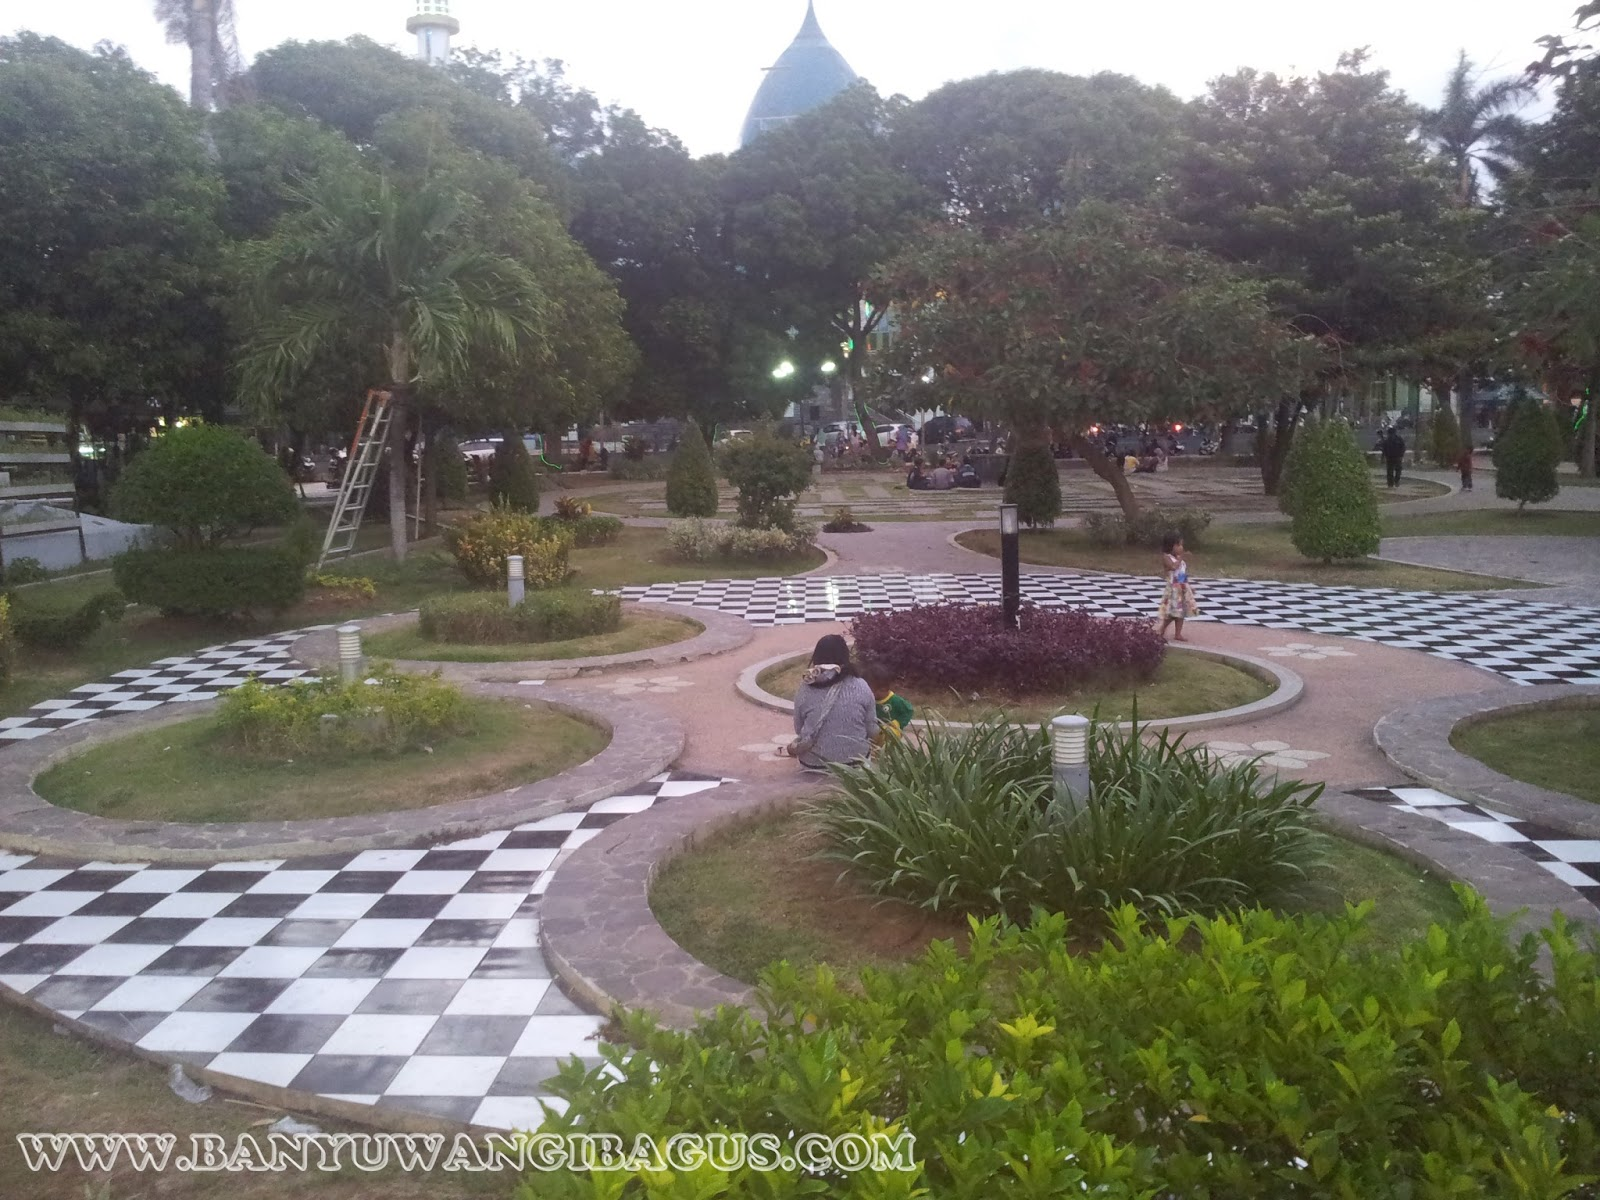 Cantiknya Taman Sri Tanjung Banyuwangi Bagus Sritanjung Kabupaten Blambangan Kab